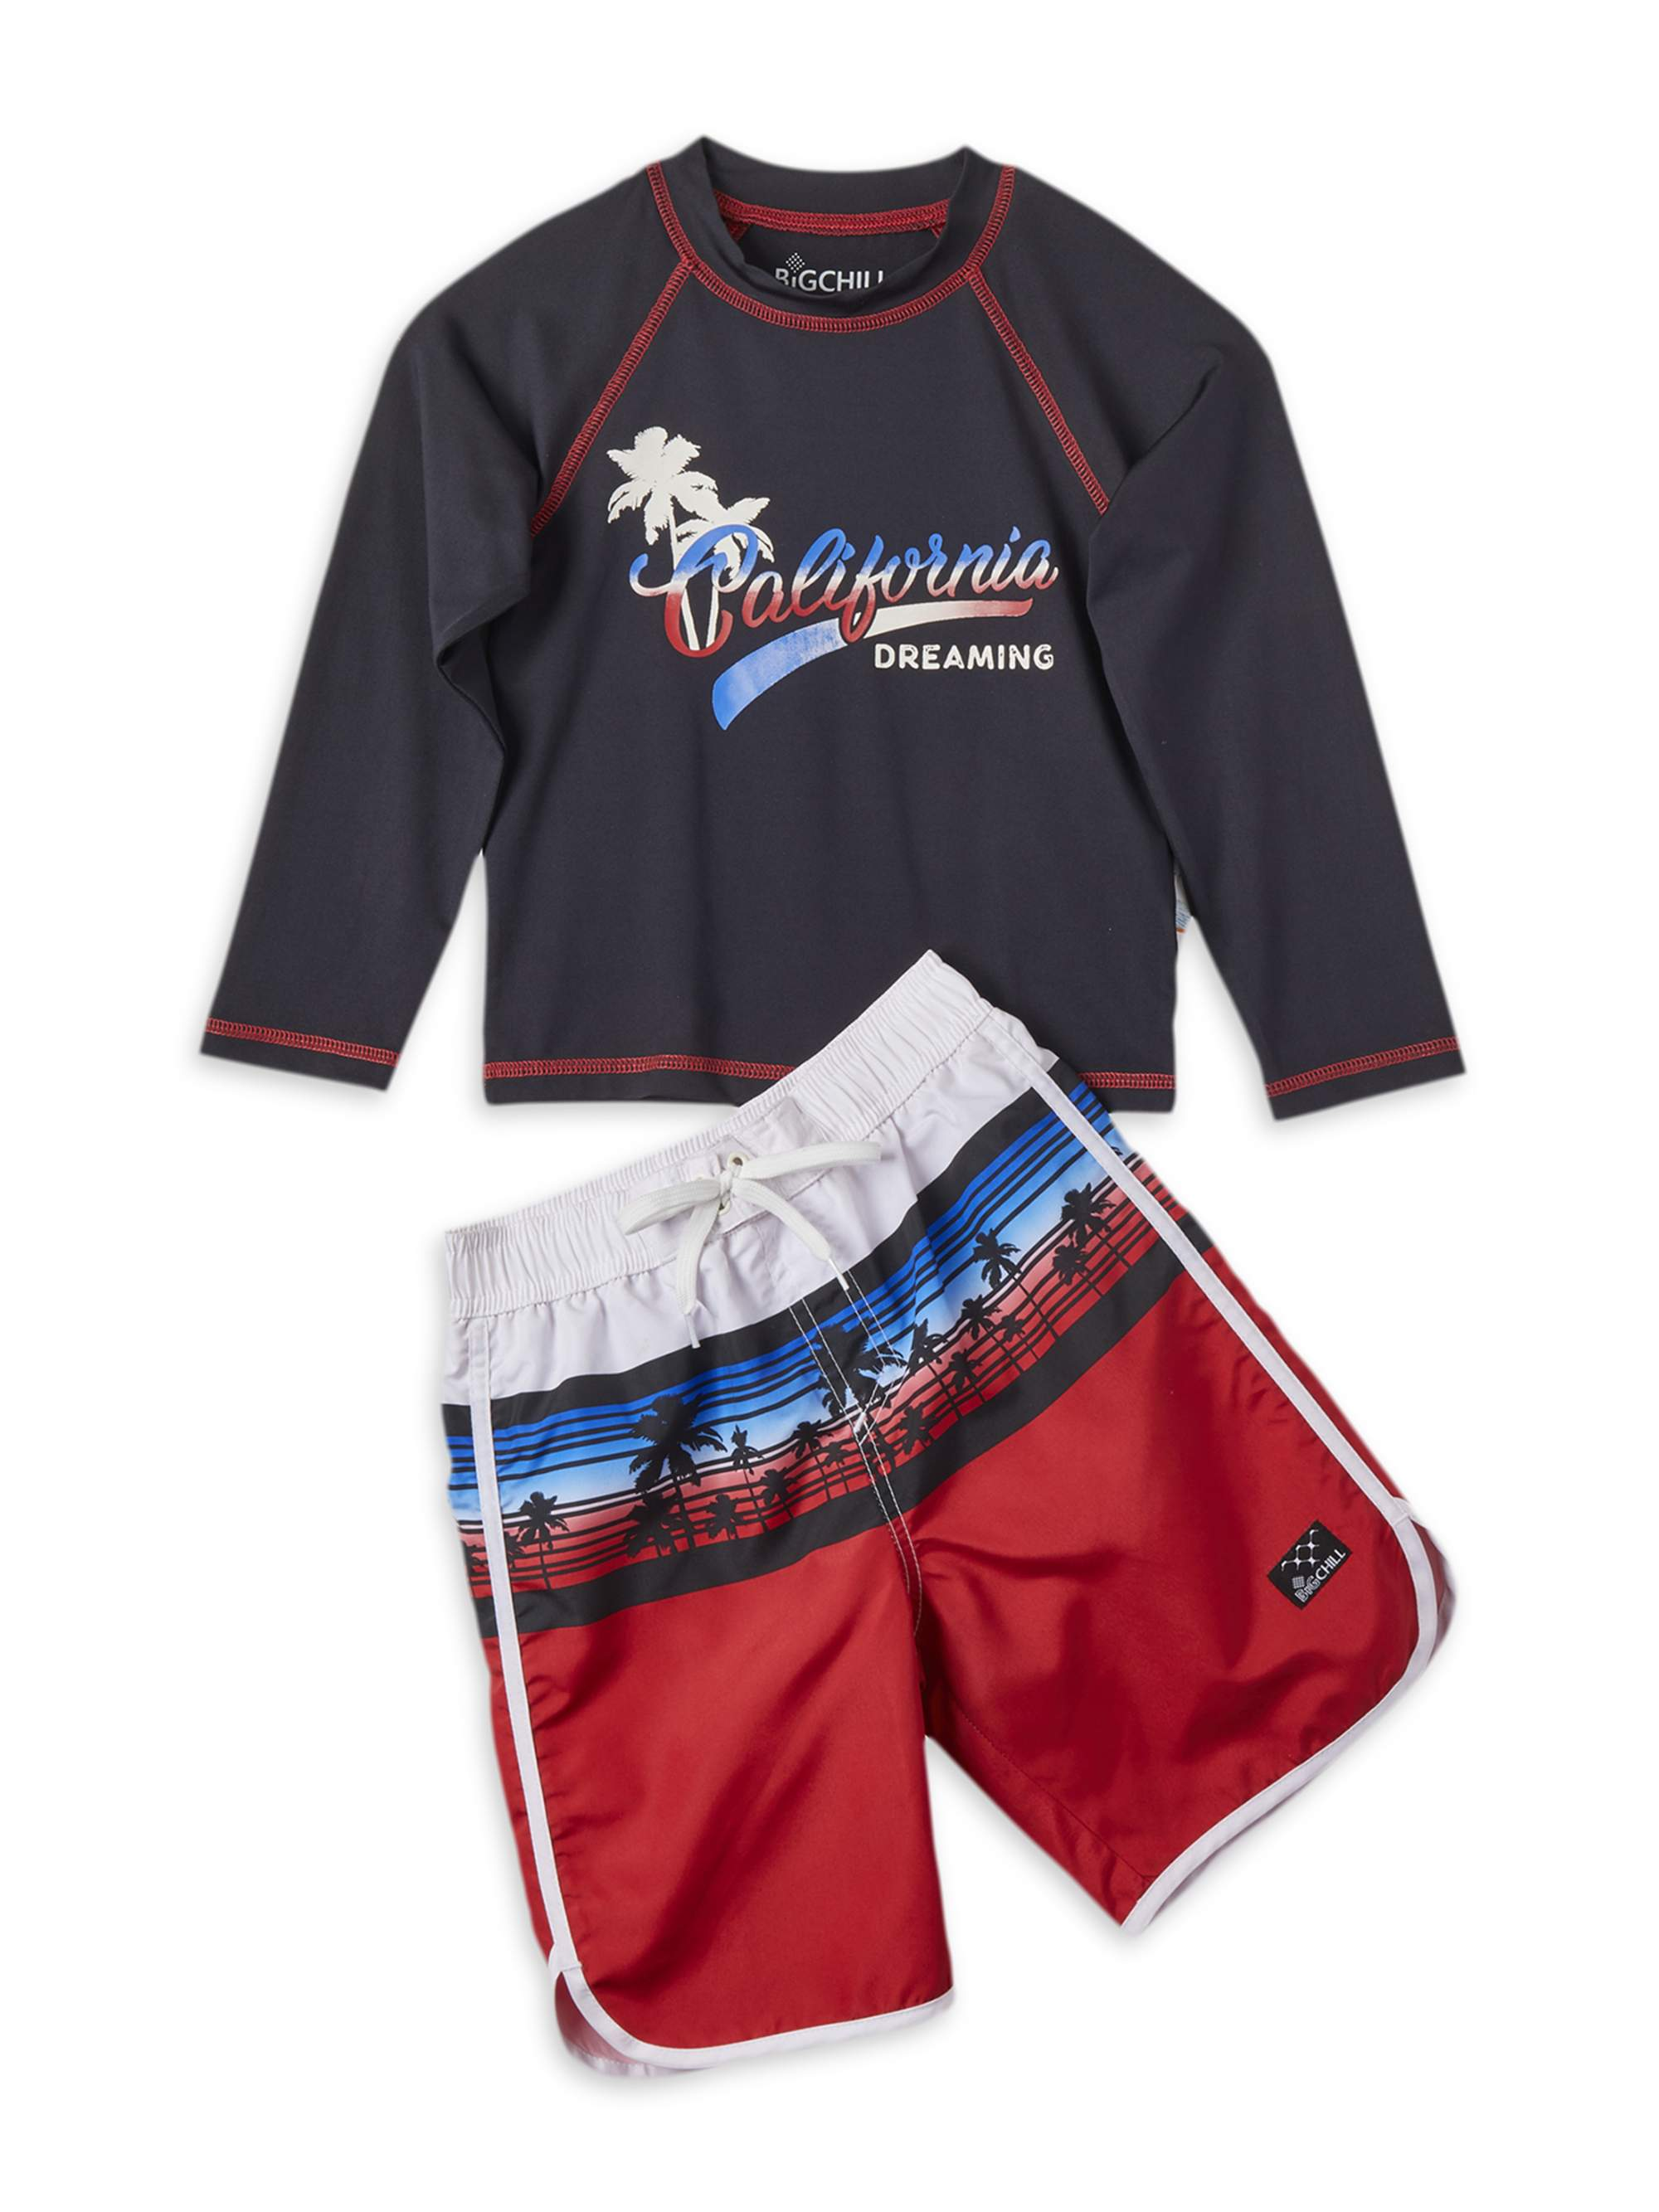 2 Piece Infant Boys Print Swim Set Swimwear Top Shorts 13 Yrs, Star Wars